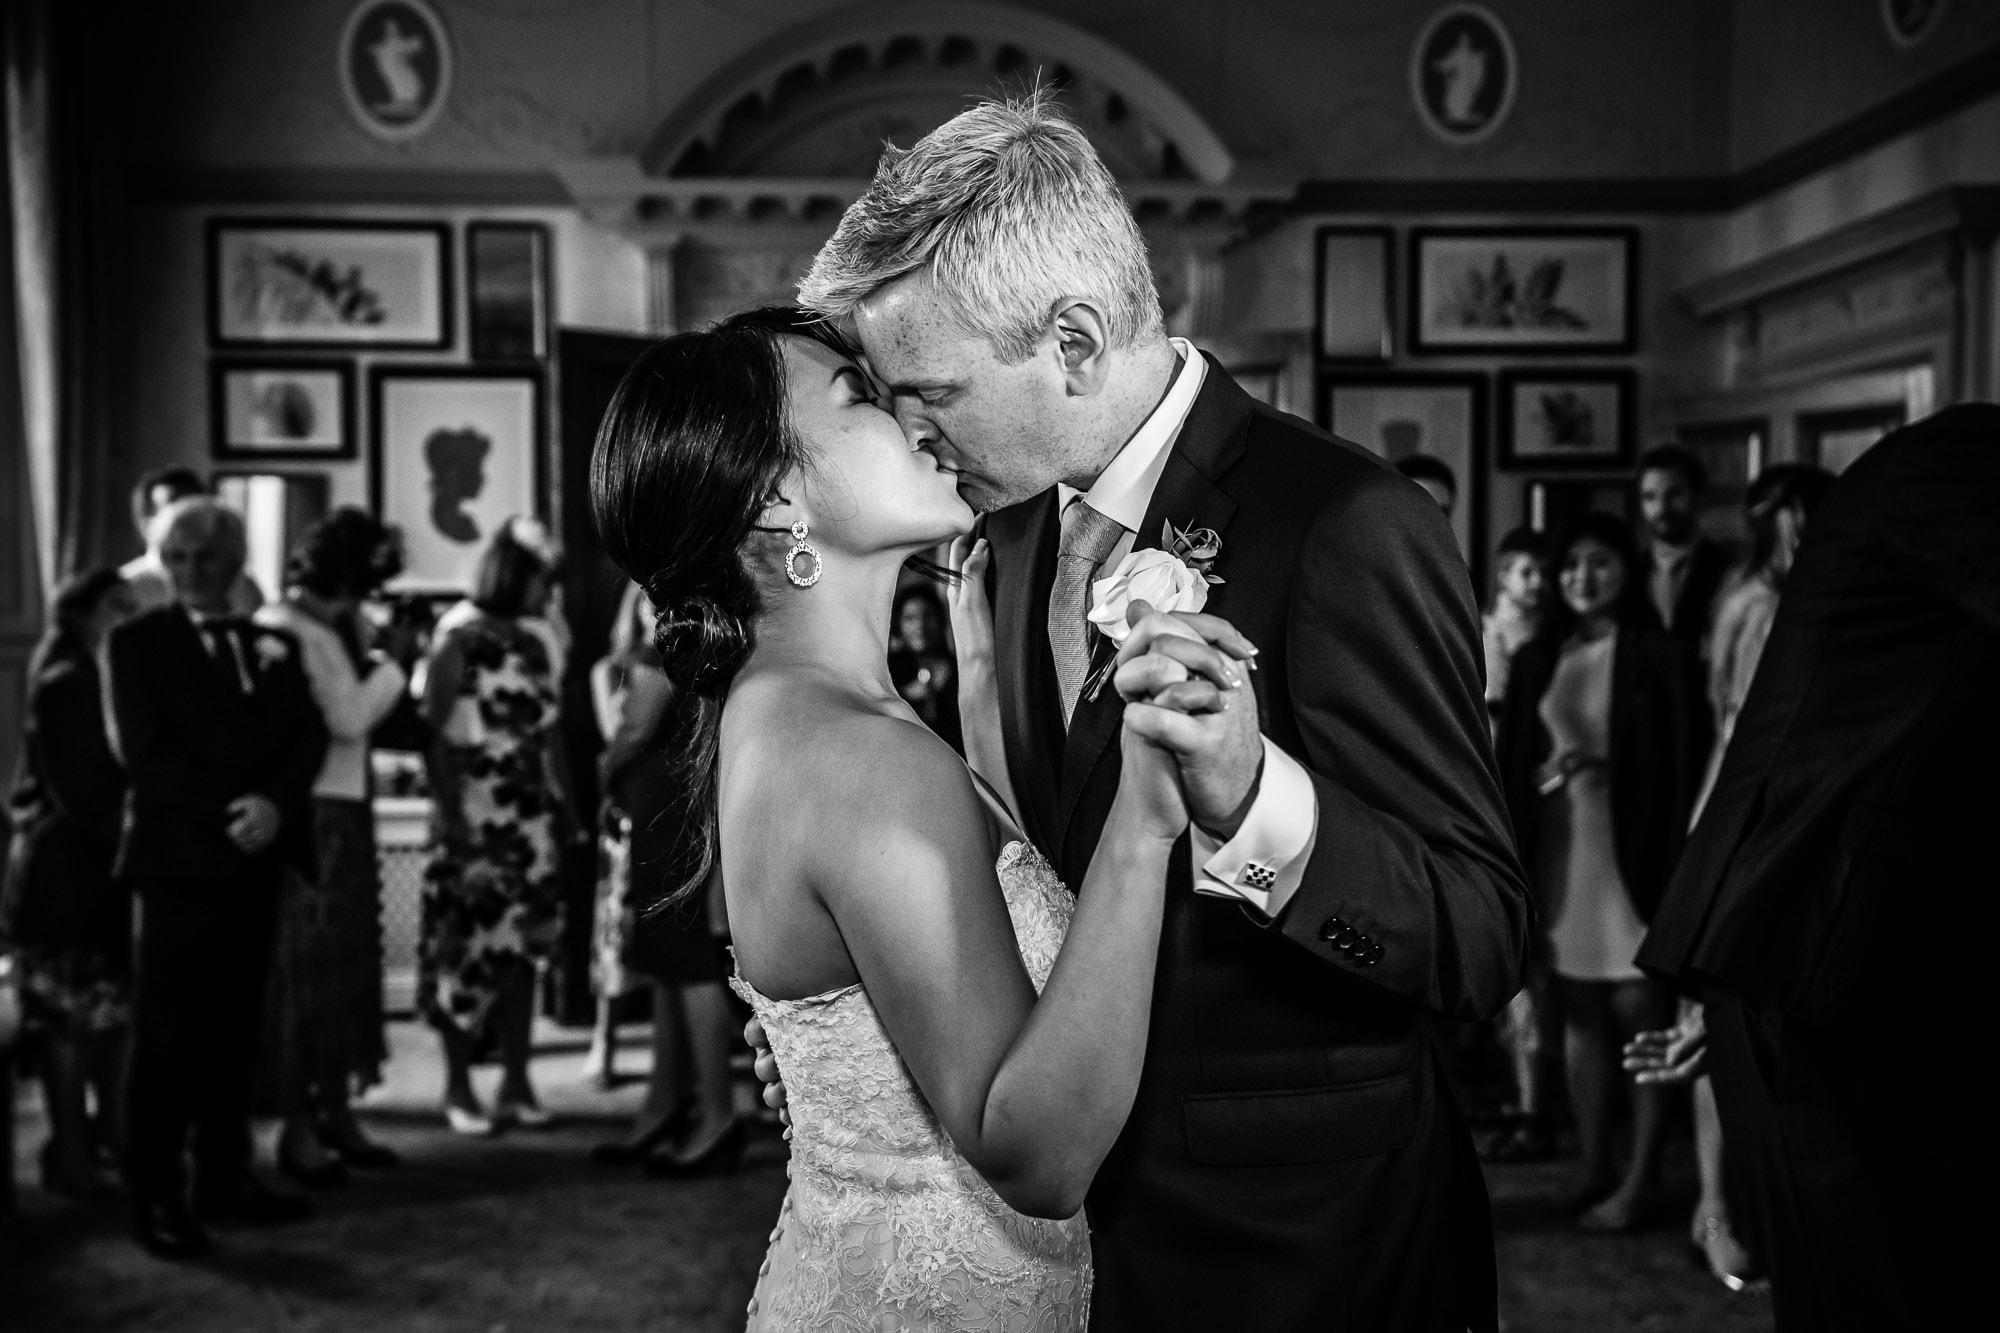 First Dance De Vere Wokefiled Estate wedding photography